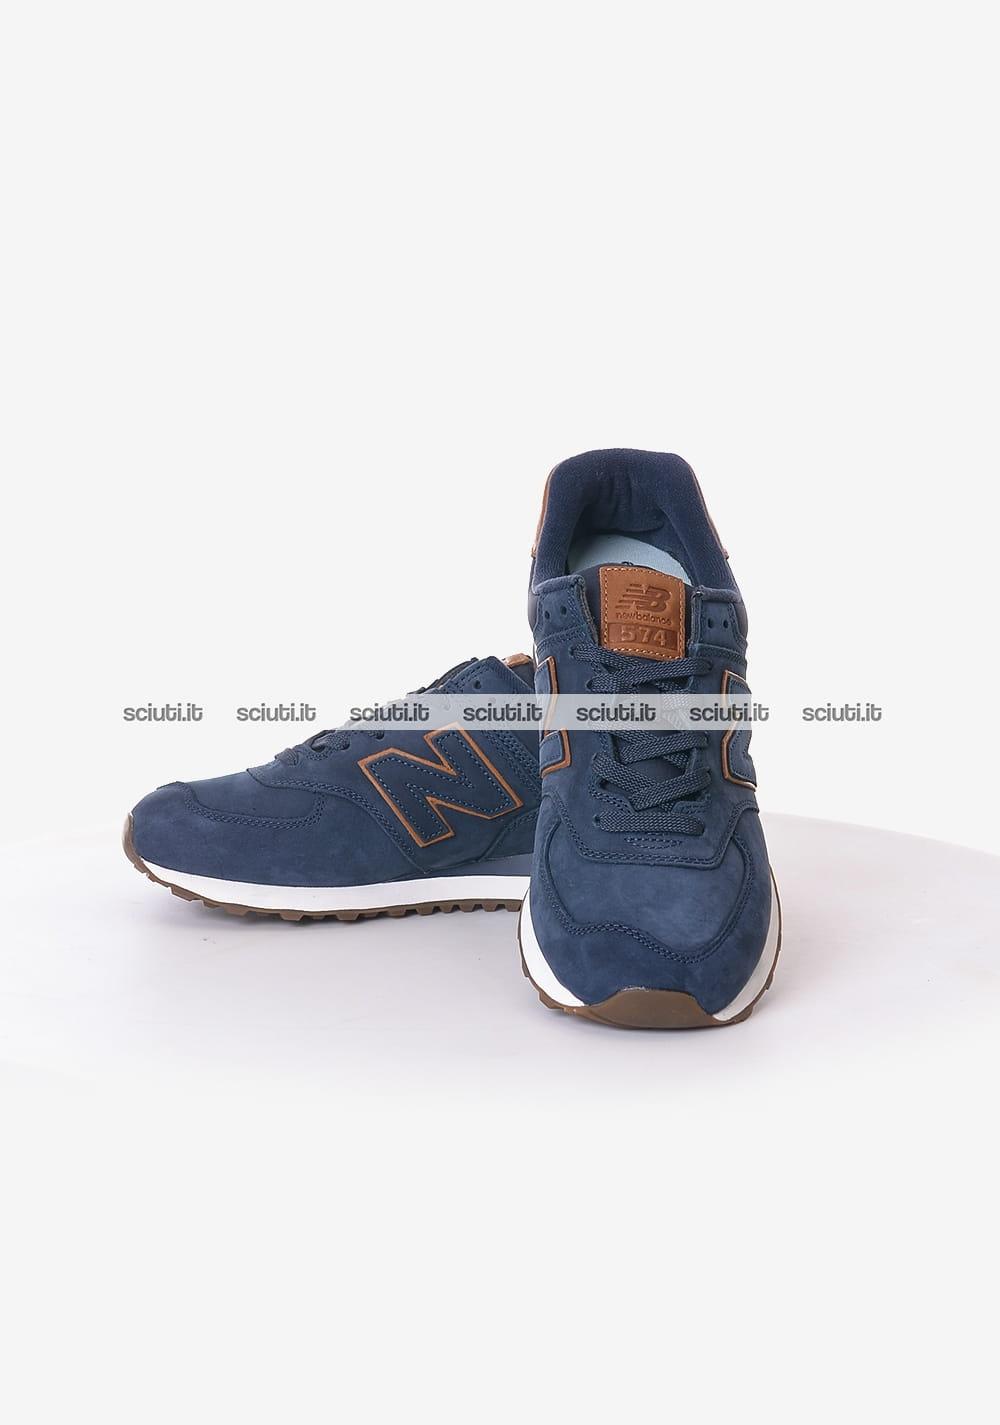 new balance 574 uomo blu scuro